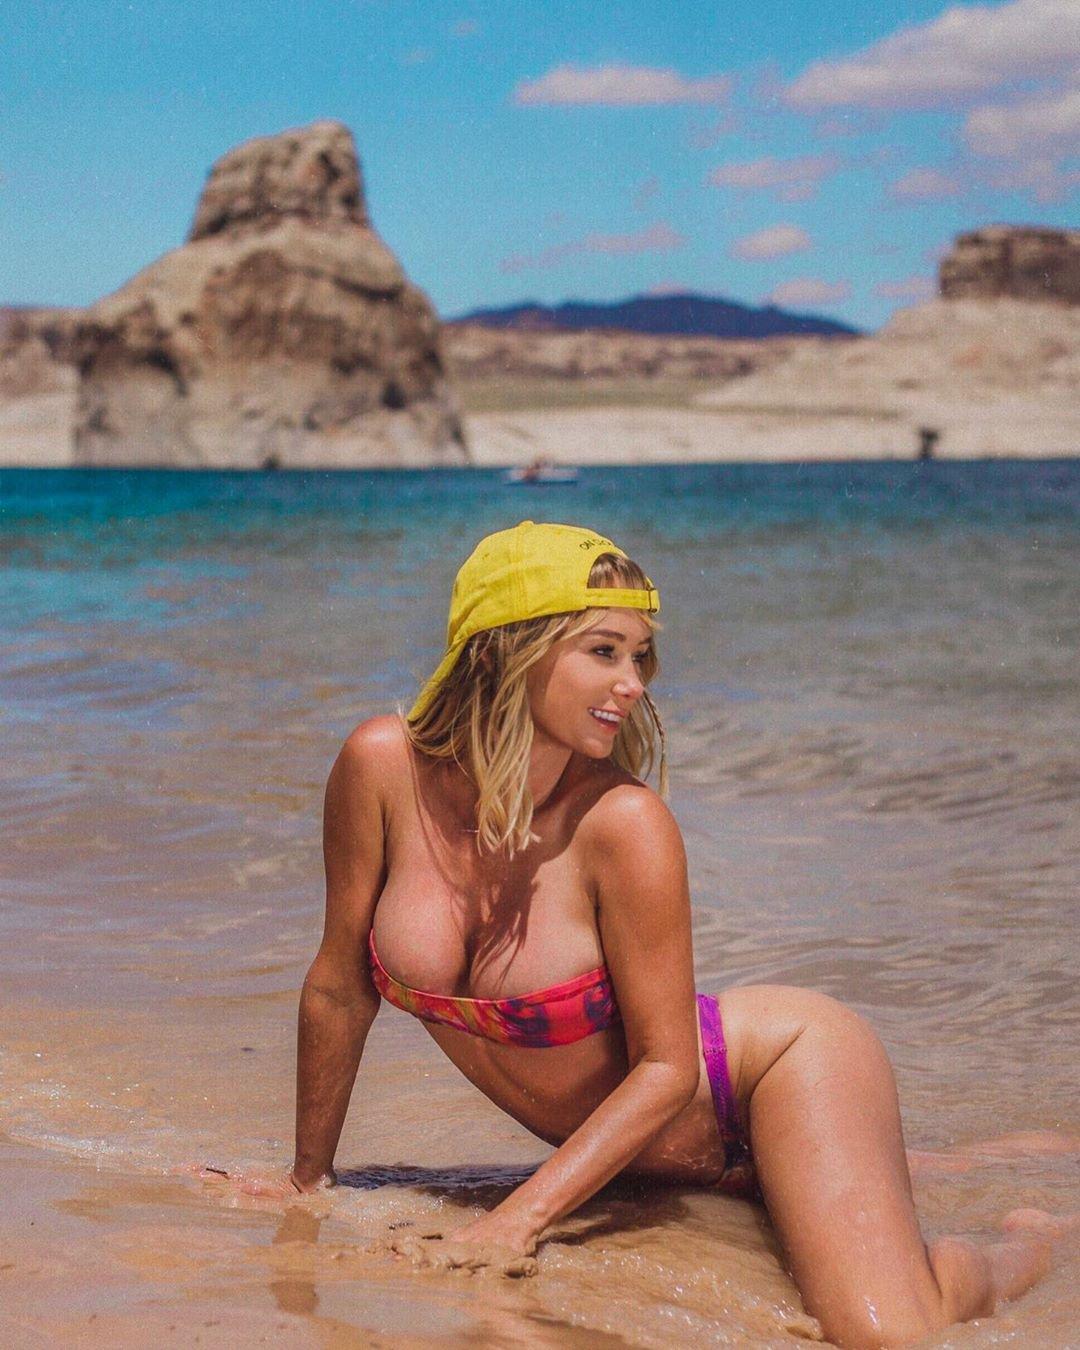 Sara Underwood Sexy Boobs